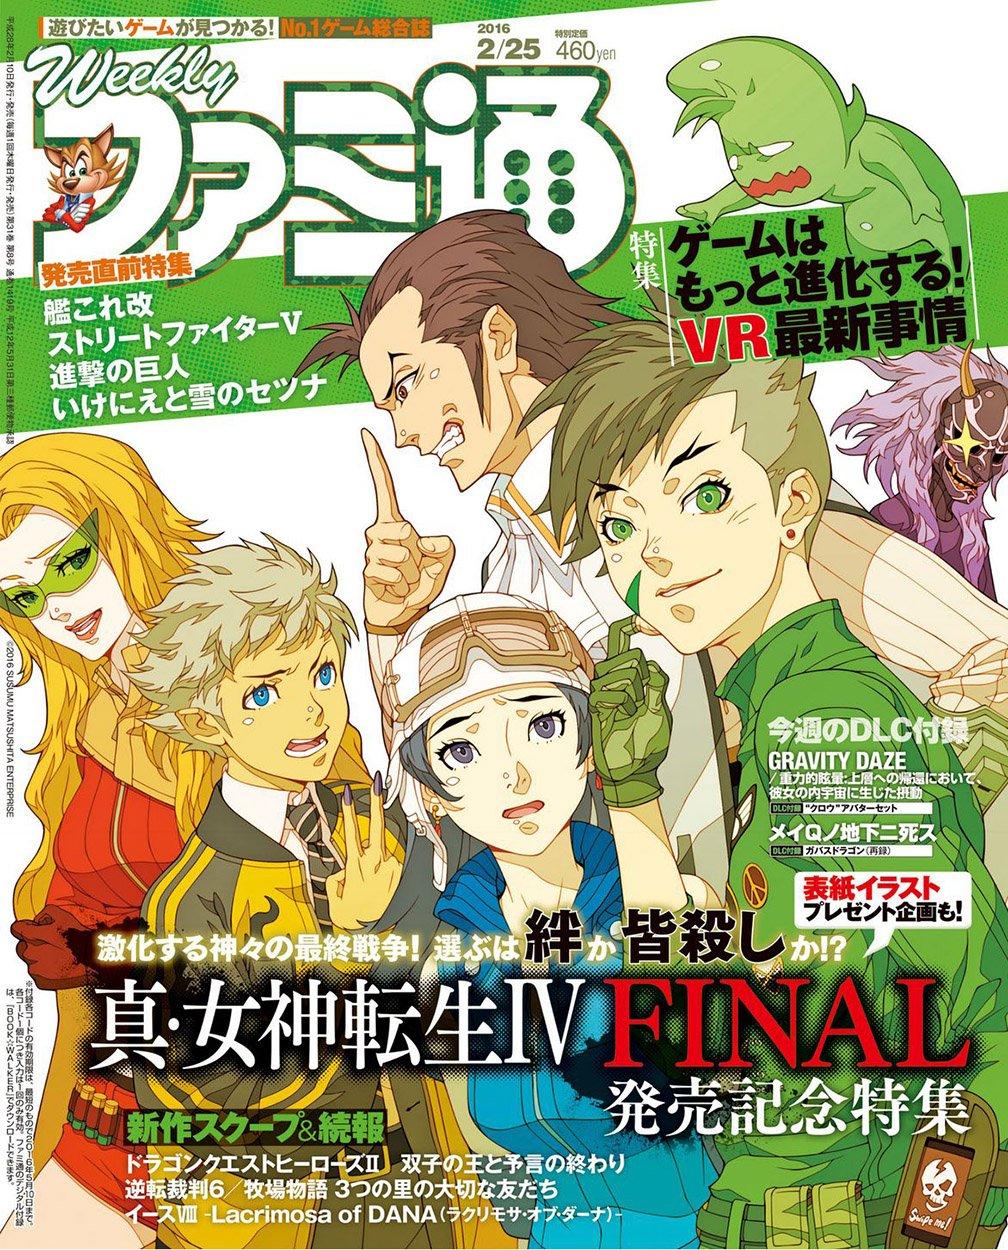 Famitsu 1419 February 25, 2016